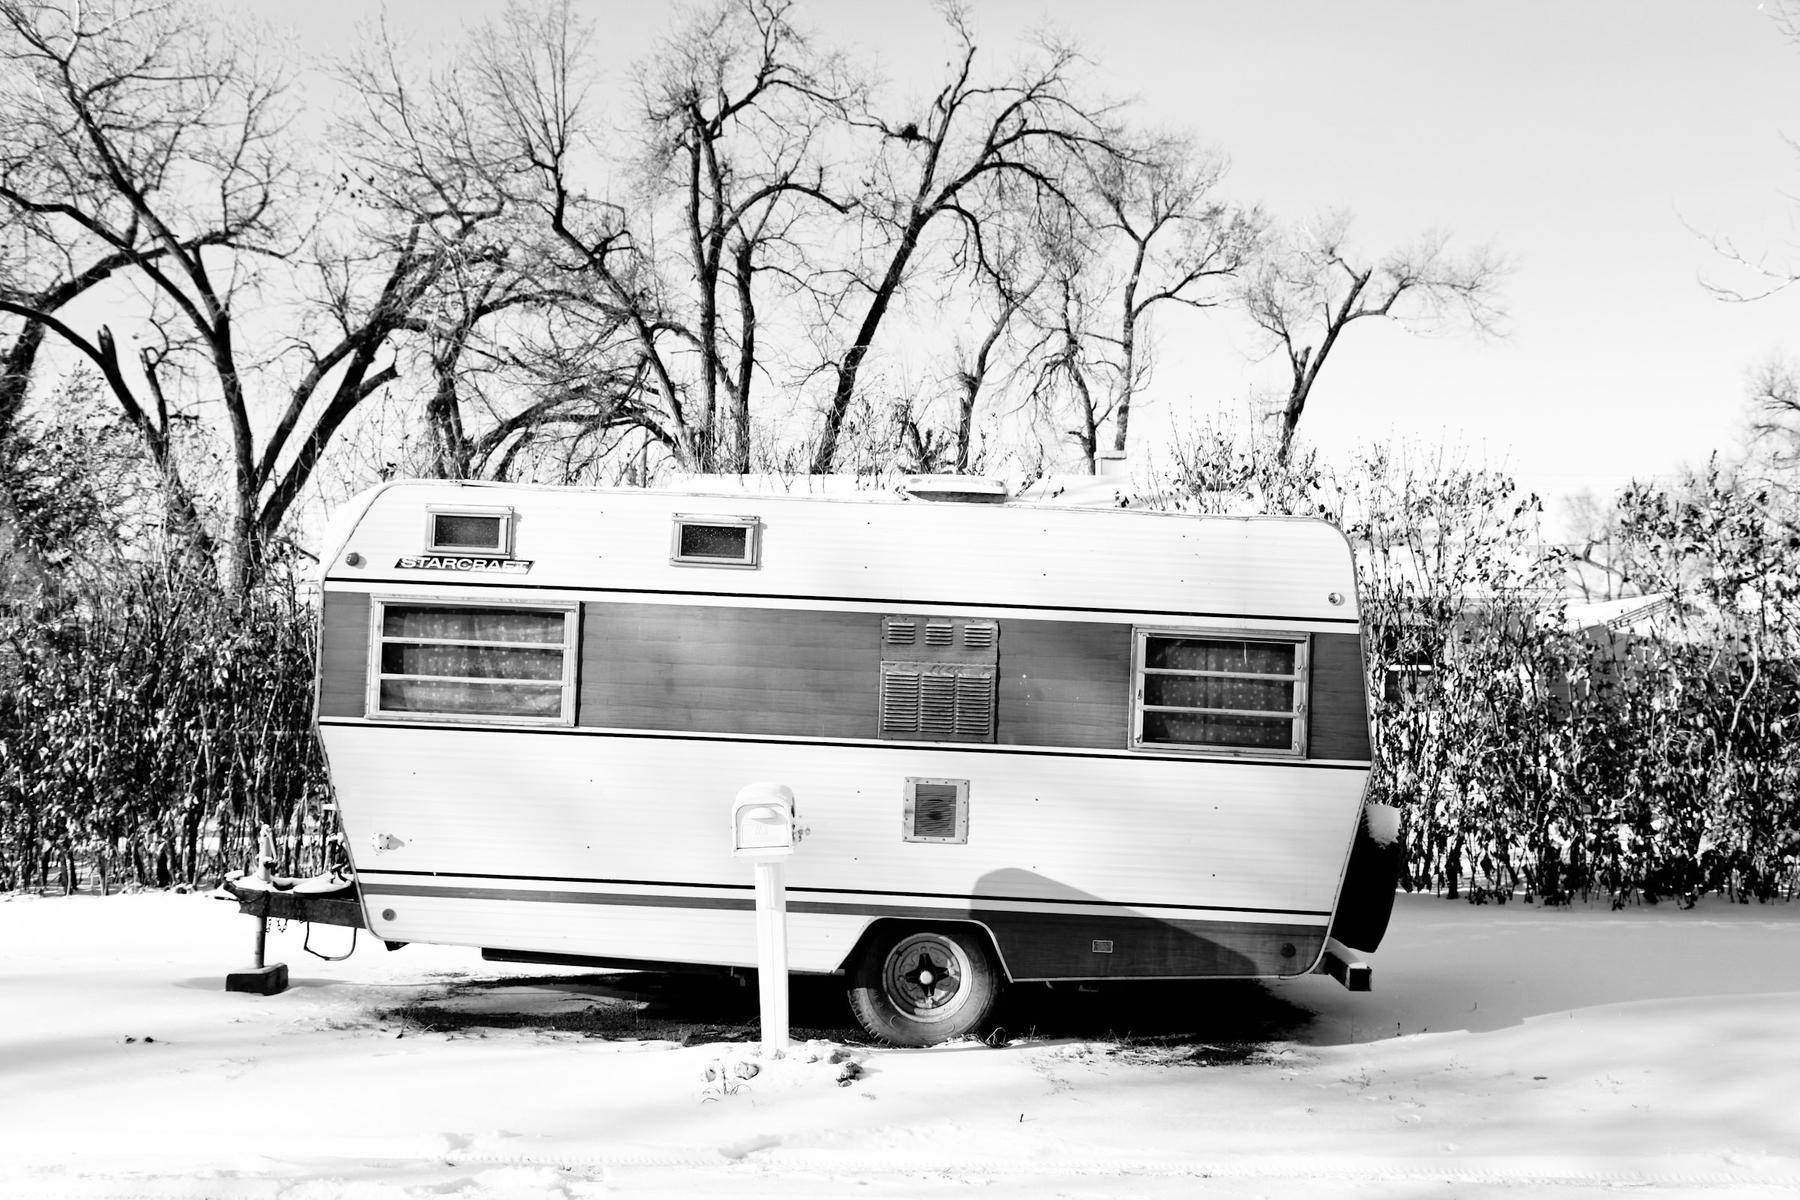 kadkins_snow-10.jpg